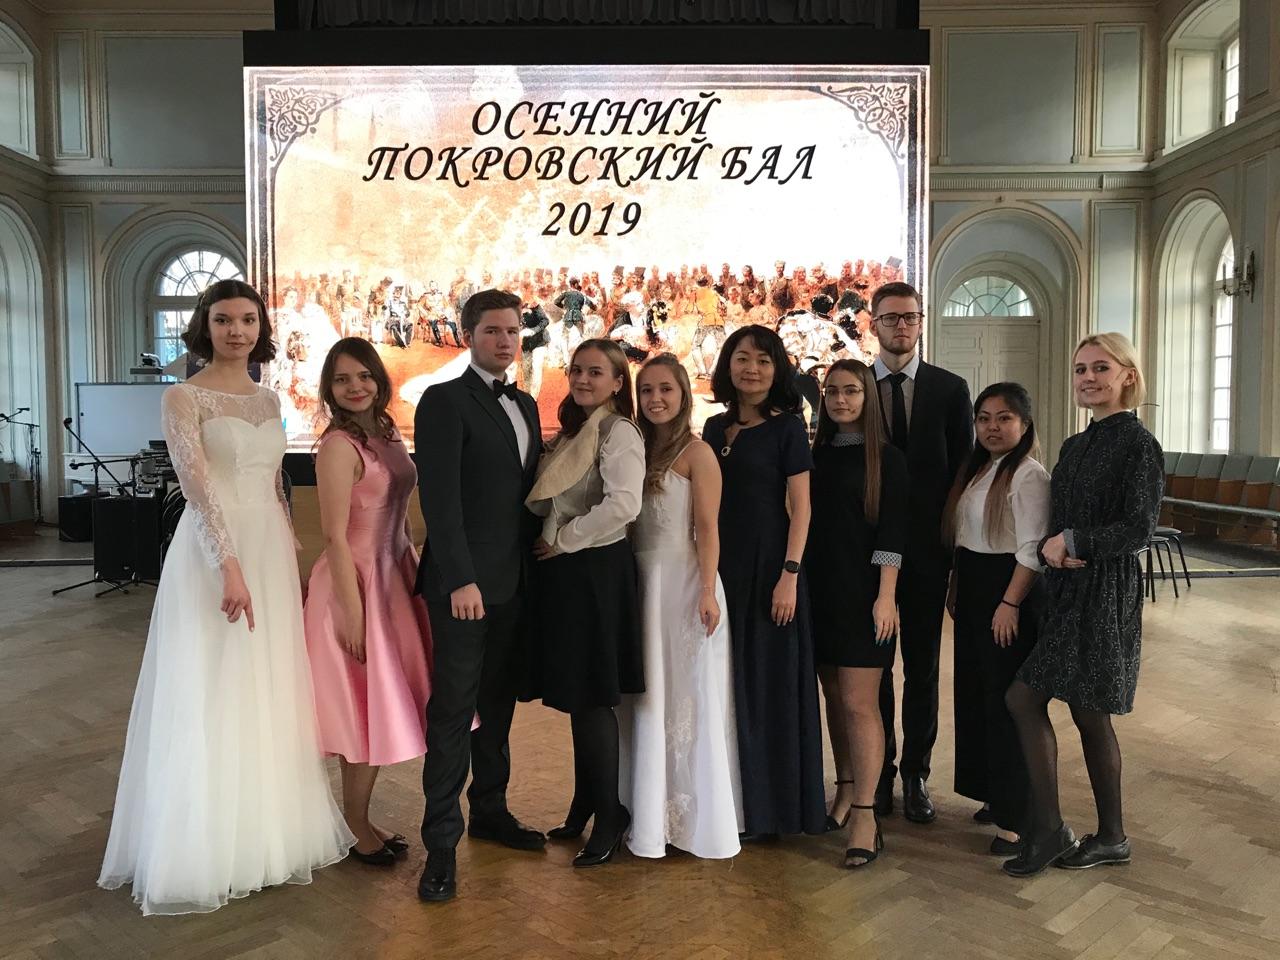 Осенний Покровский бал